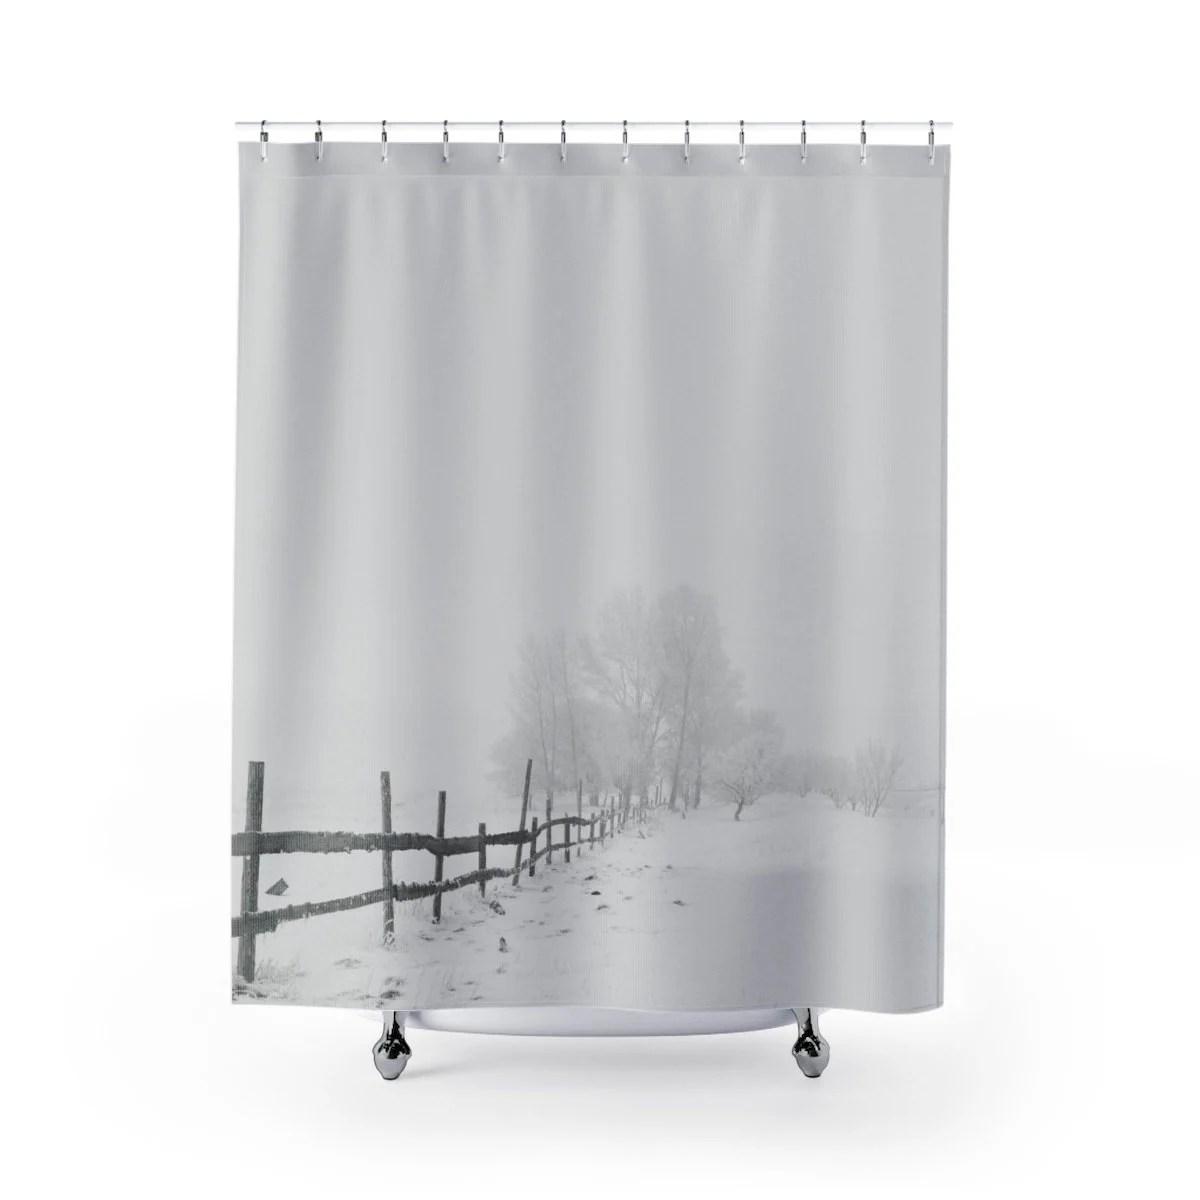 Winter Snow Shower Curtains Shower Curtain Boho White Shower Curtain Modern Shower Curtain Grey Modern Bathroom Decor Christmas Gift